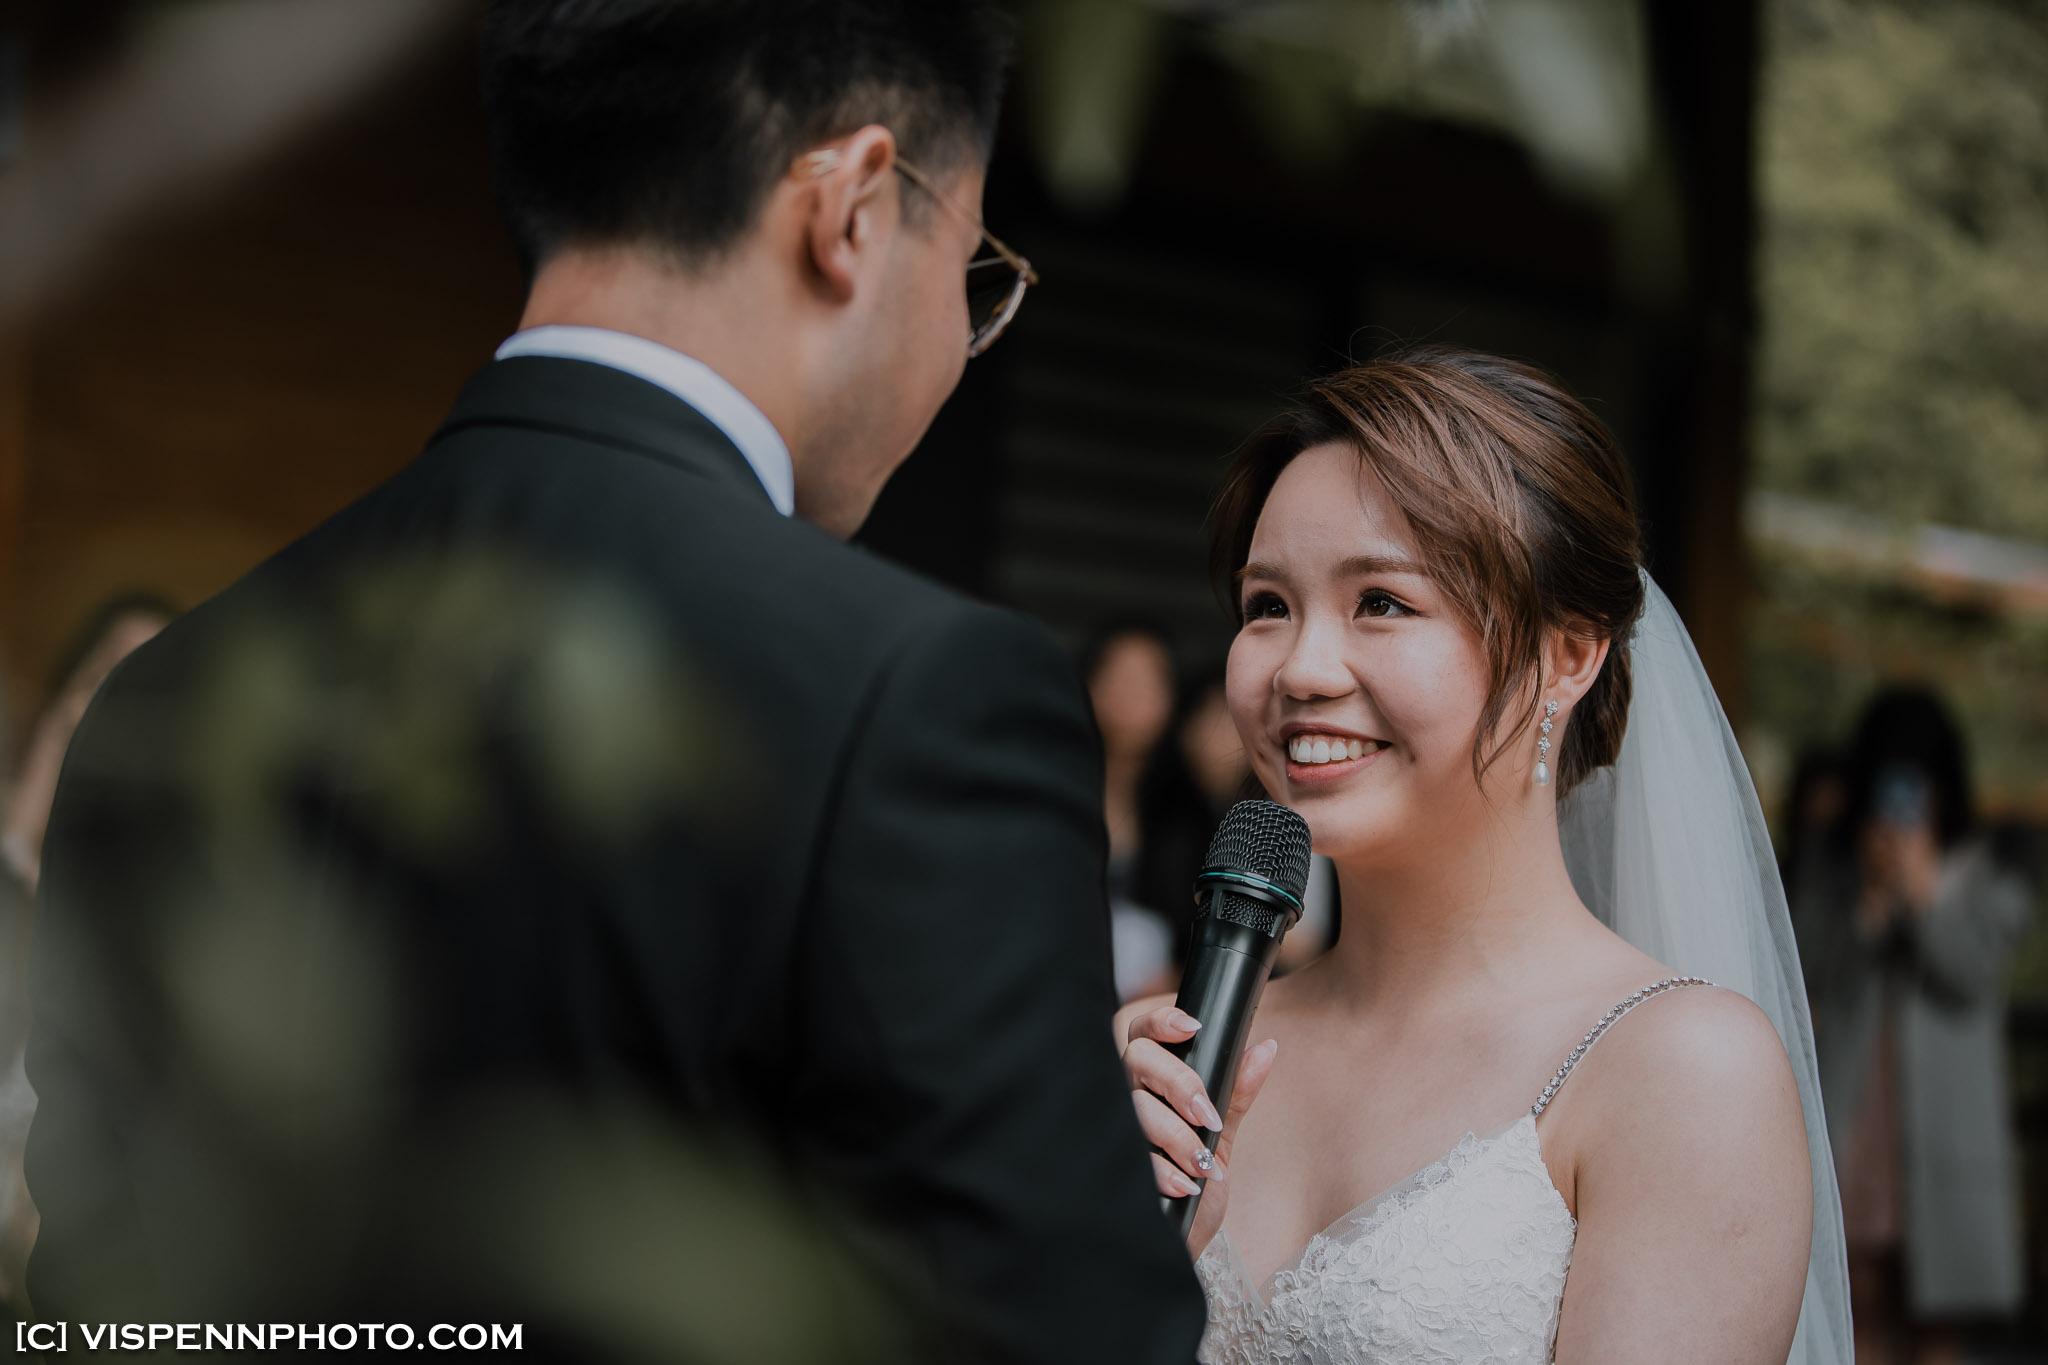 WEDDING DAY Photography Melbourne VISPENN 墨尔本 婚礼跟拍 婚礼摄像 婚礼摄影 结婚照 登记照 ElitaPB 08191 1P EOSR VISPENN